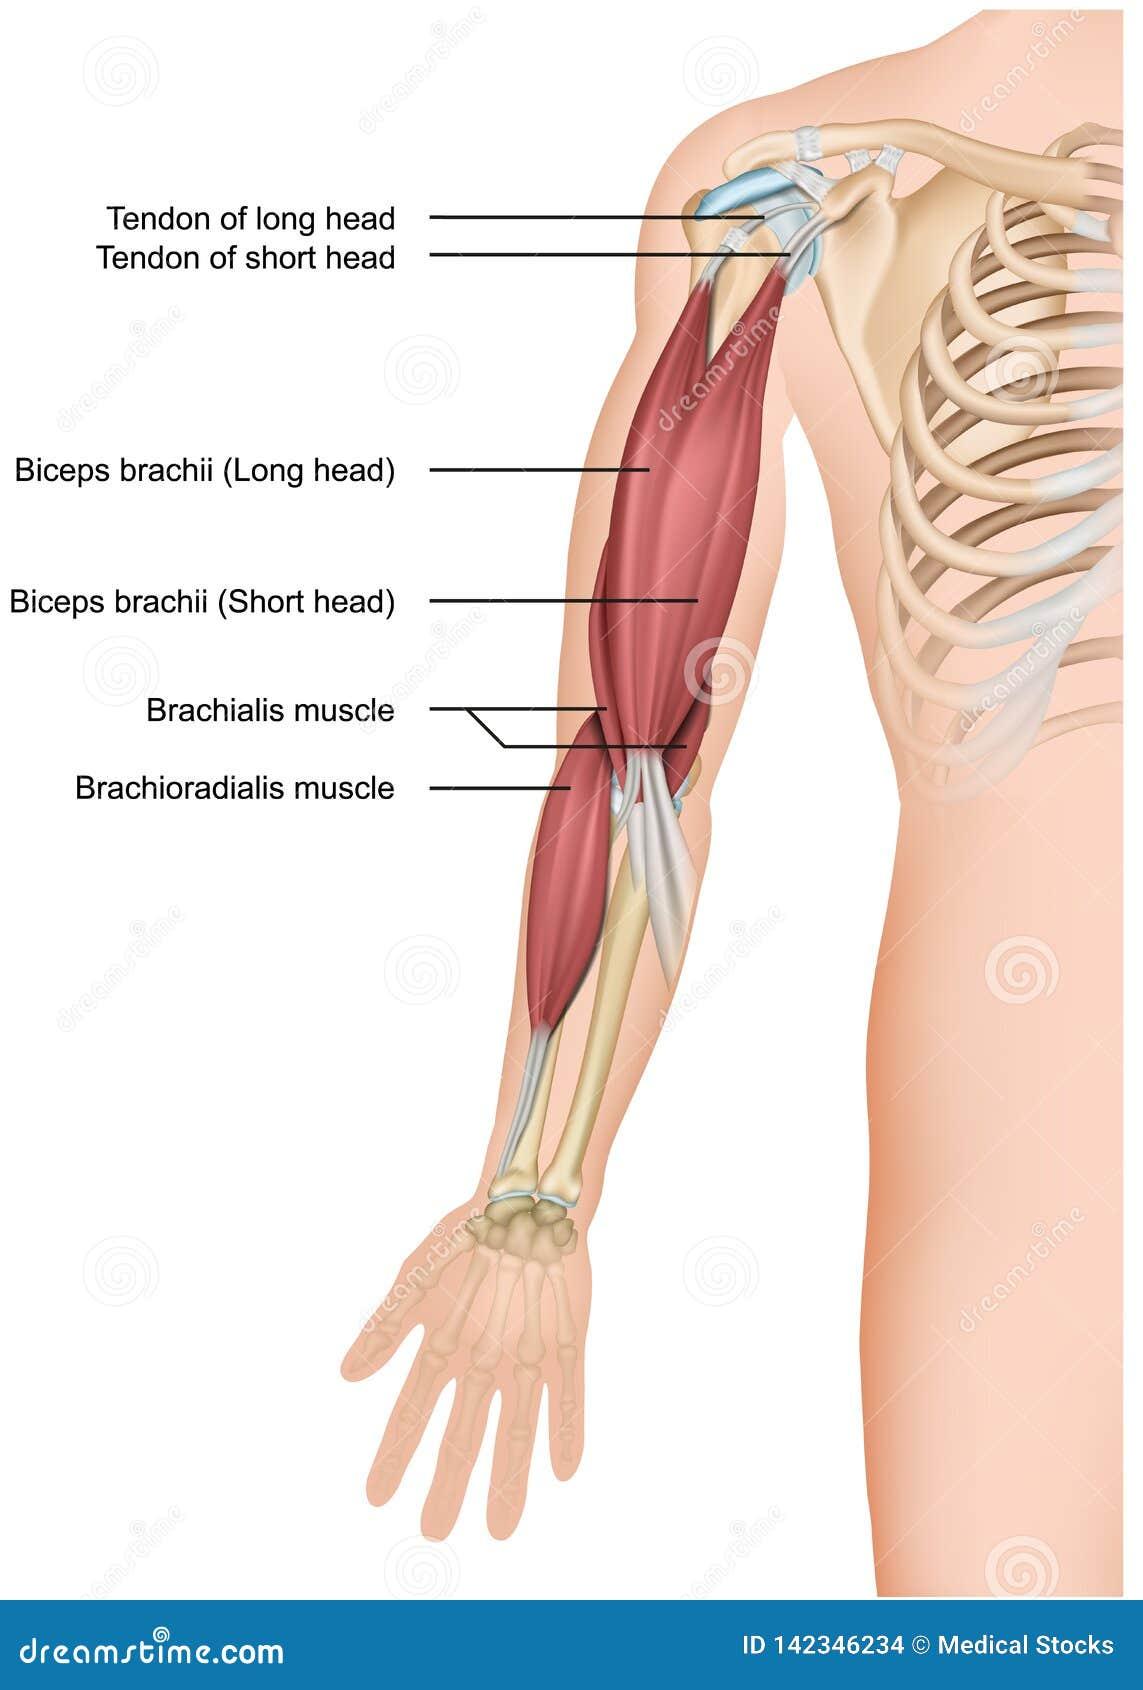 Biceps and brachioradialis anatomy 3d medical  illustration on white background